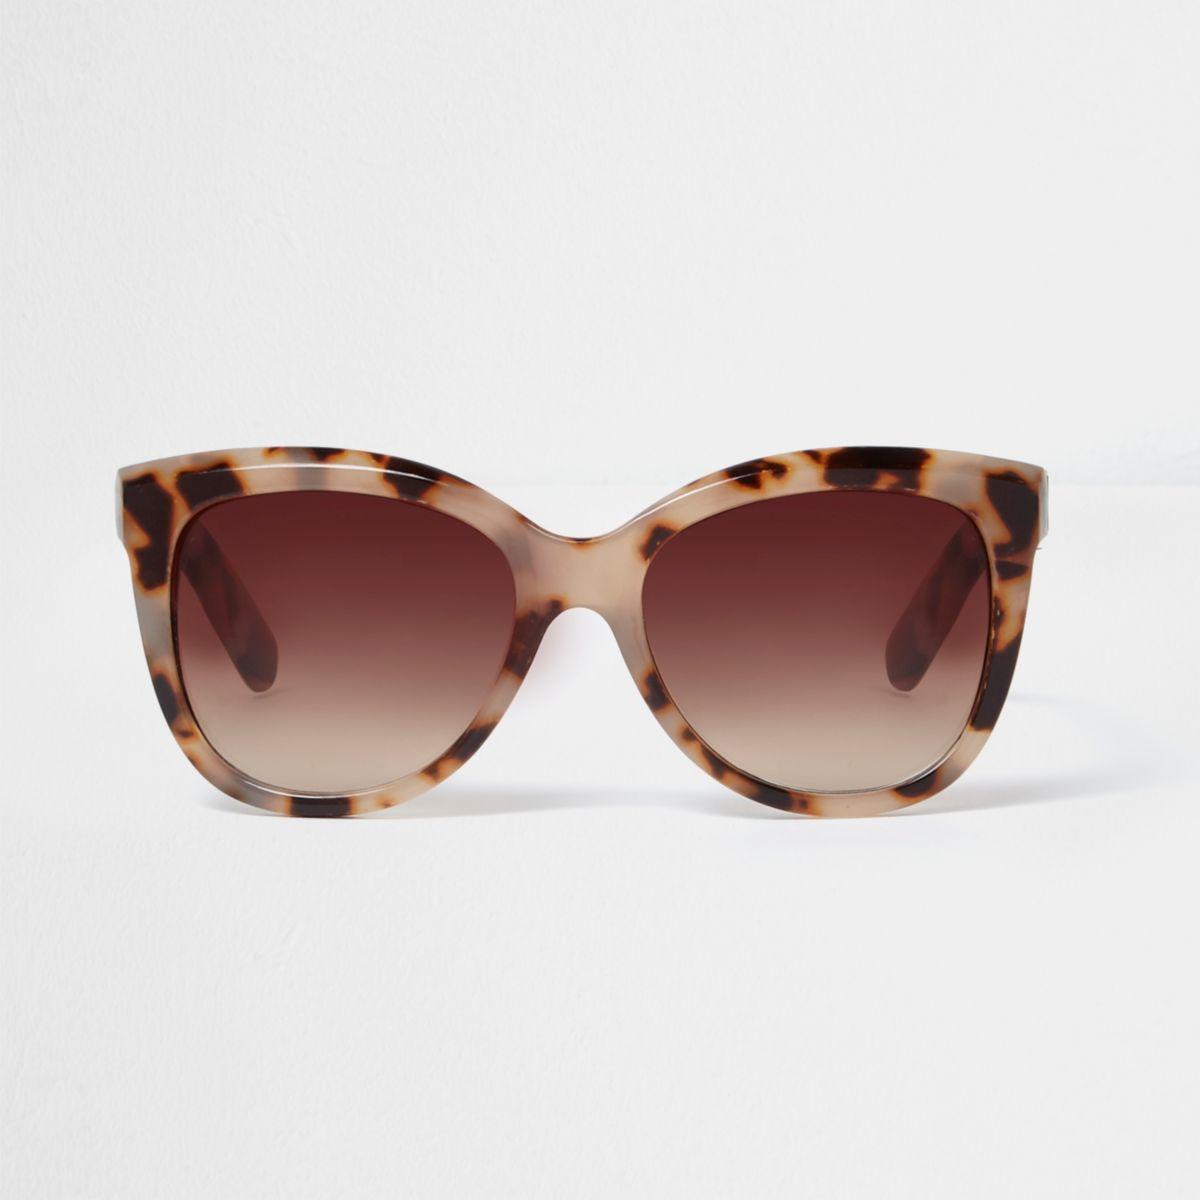 Beige leopard print glam sunglasses